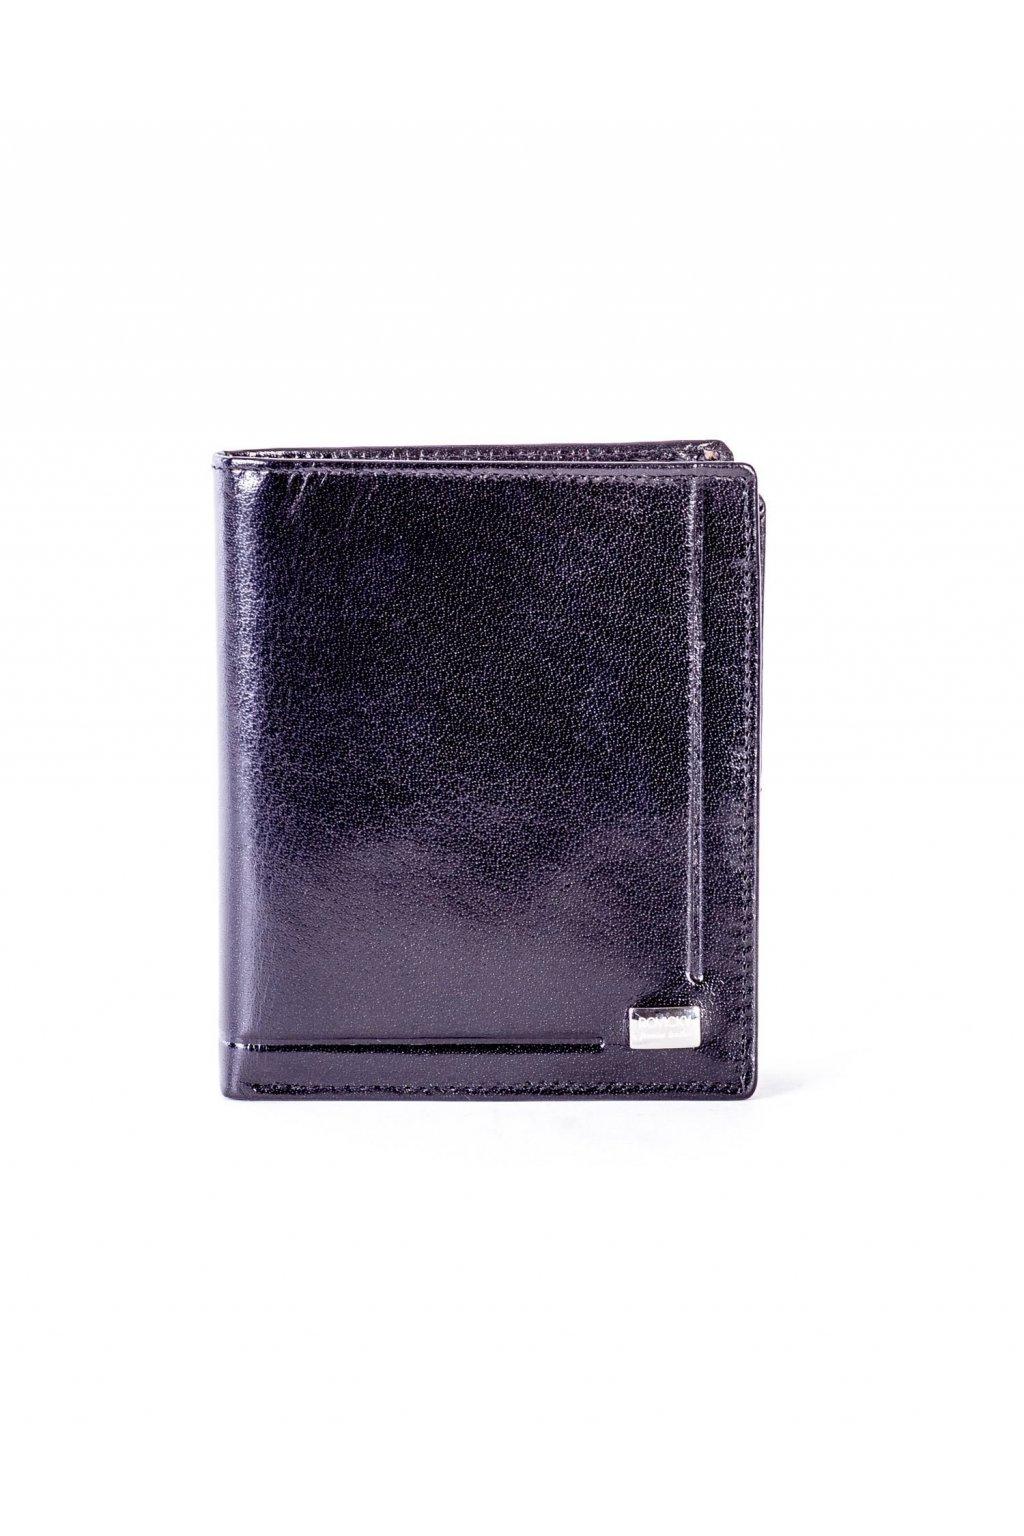 Pánska peňaženka kód CE-PR-PC-106-BAR.13